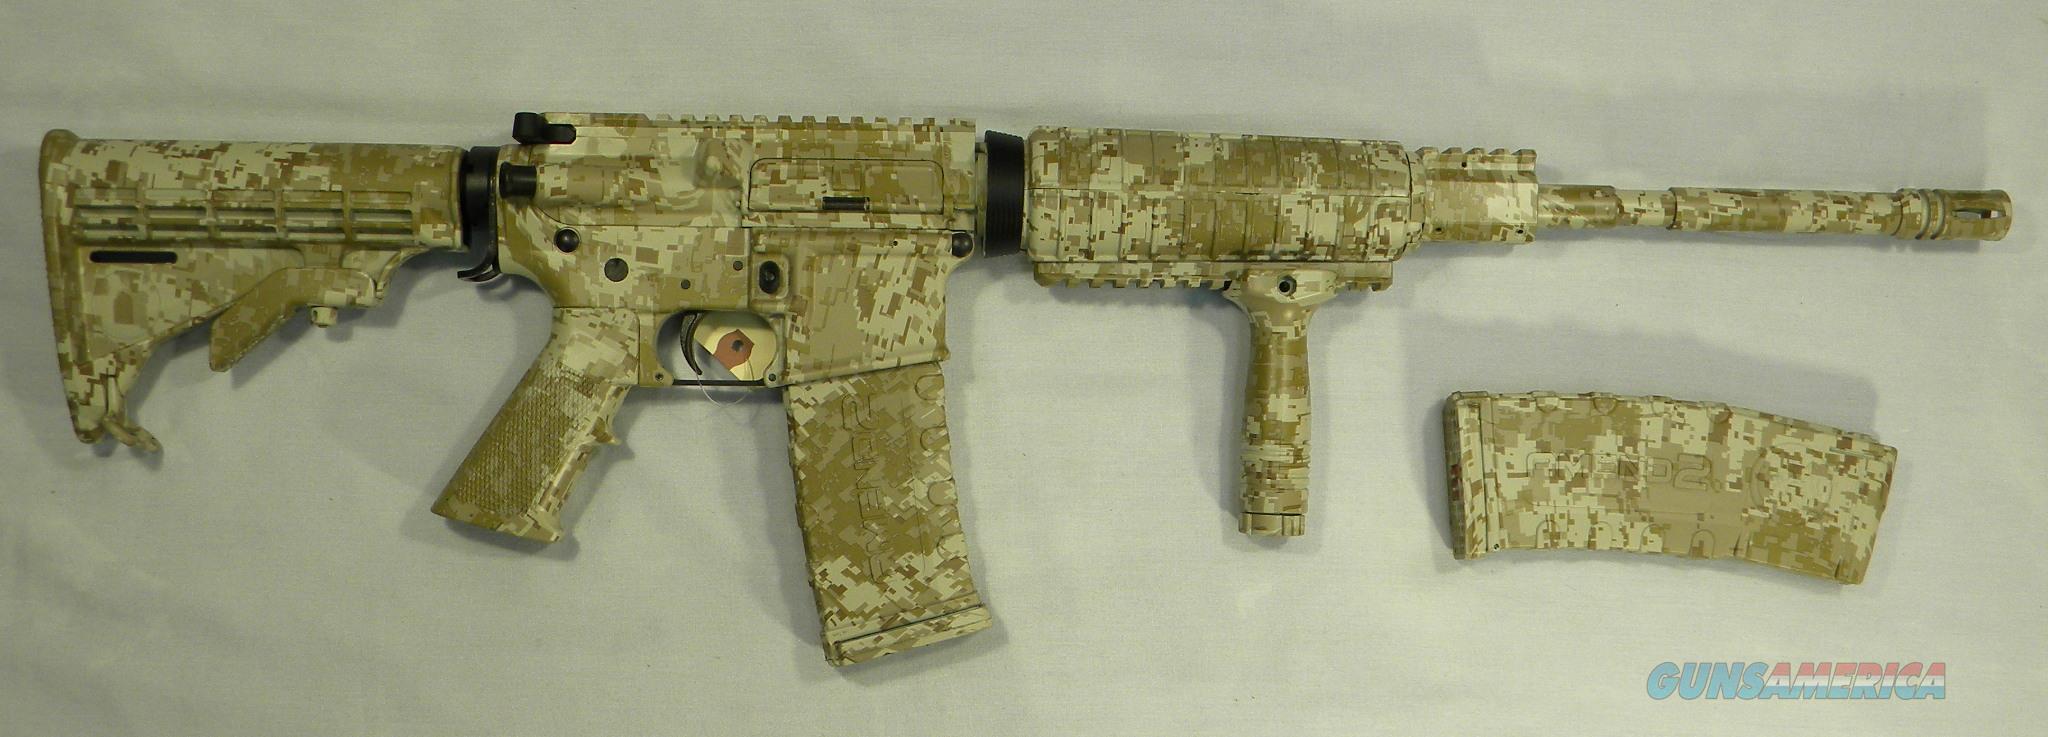 AR-15 Rifle, AOS Exclusive! LAR Grizzly-15 M4 Rifle In ''Tiger-Stripe'' Desert Digital Camo, 5.56 NATO/.223 Rem  Guns > Rifles > LAR/Grizzly Mfg. Co. Rifles